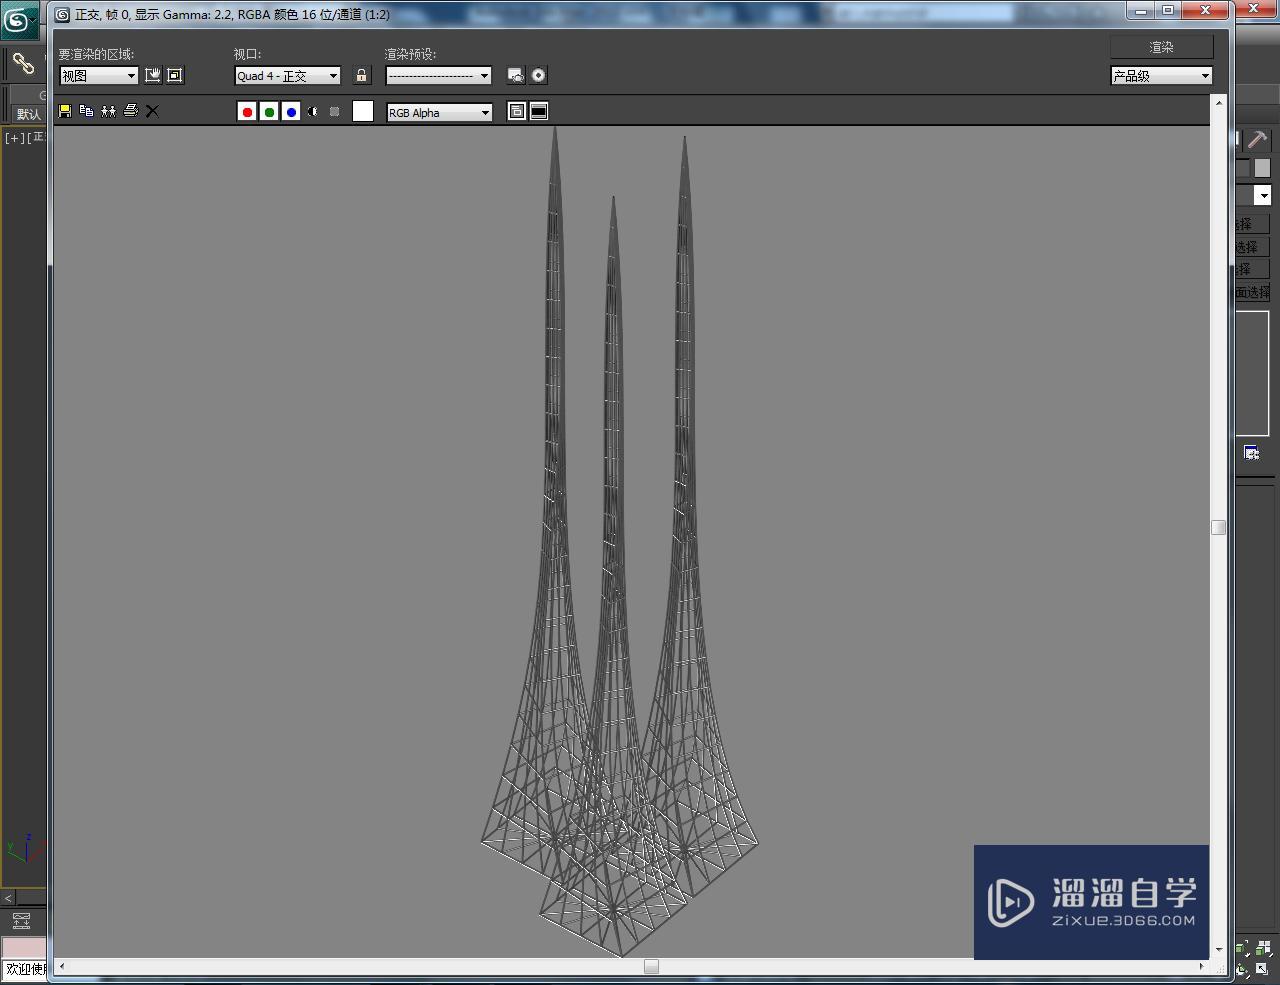 3DMax玩具铁塔模型制作教程